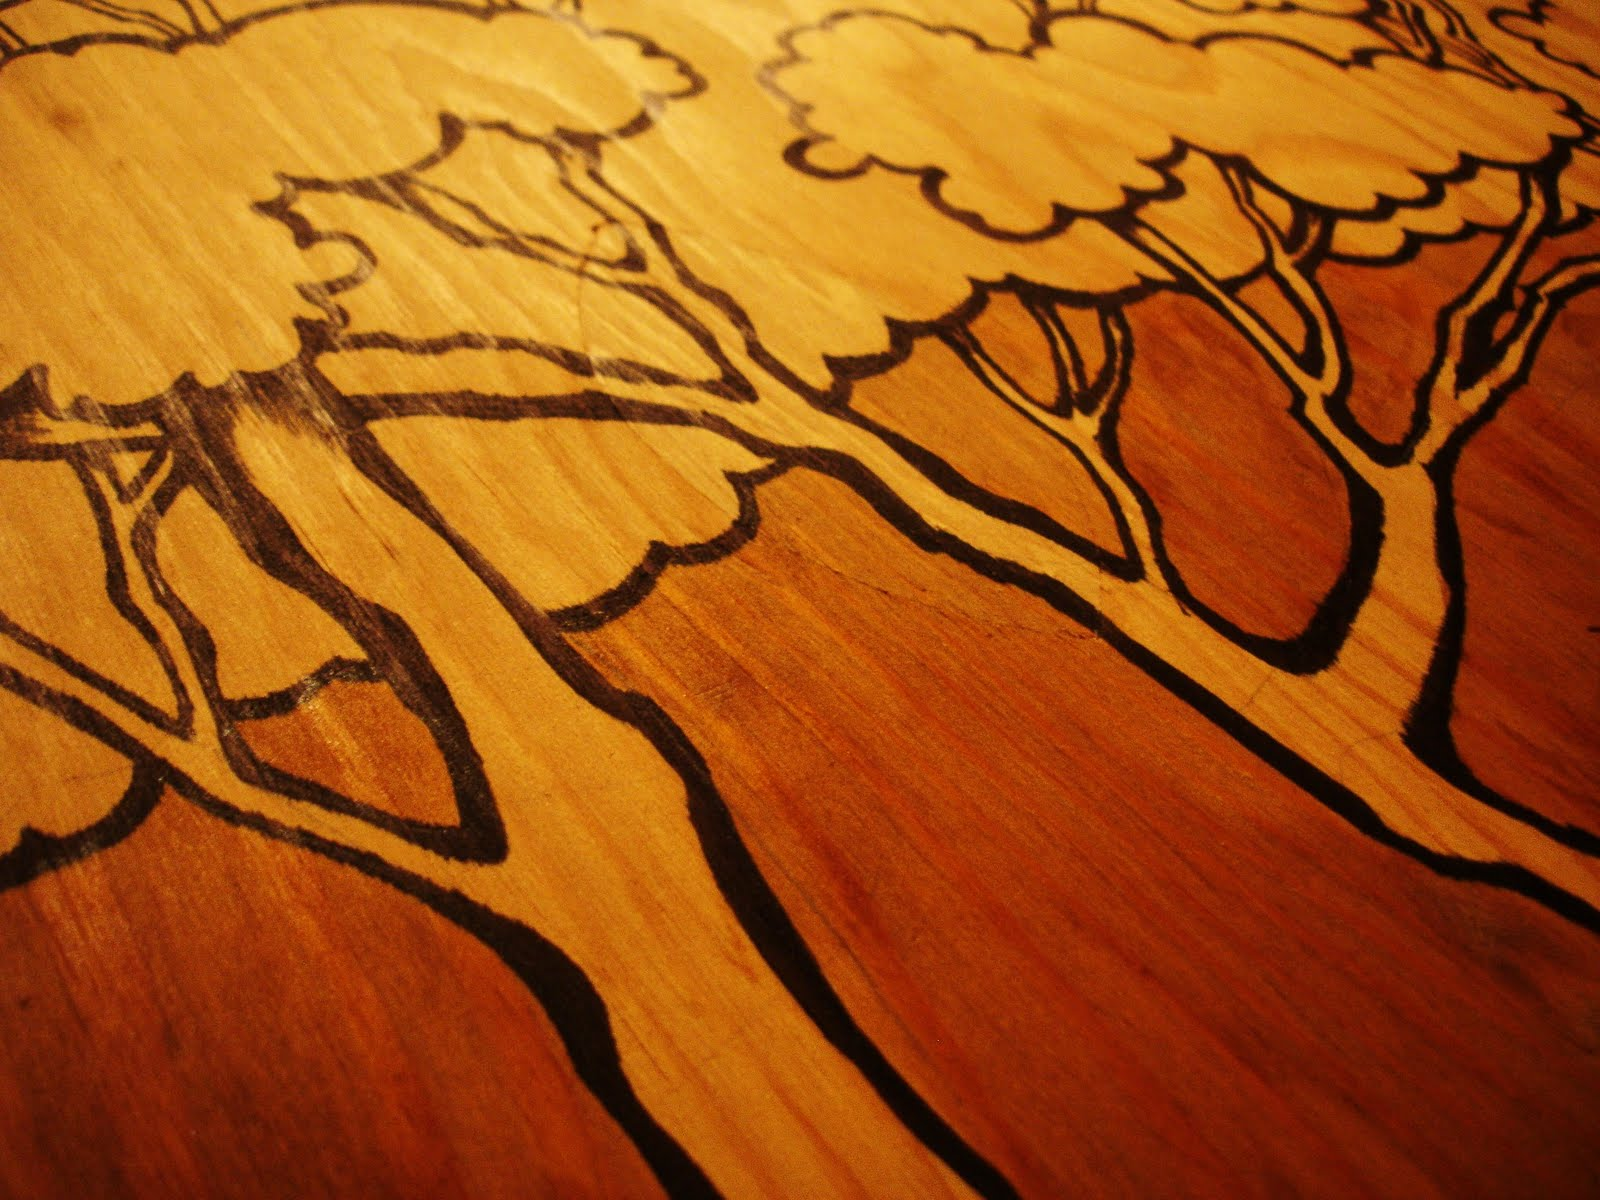 Pdf Diy Wood Stain Paint Download Wood Paterns Plansdownload